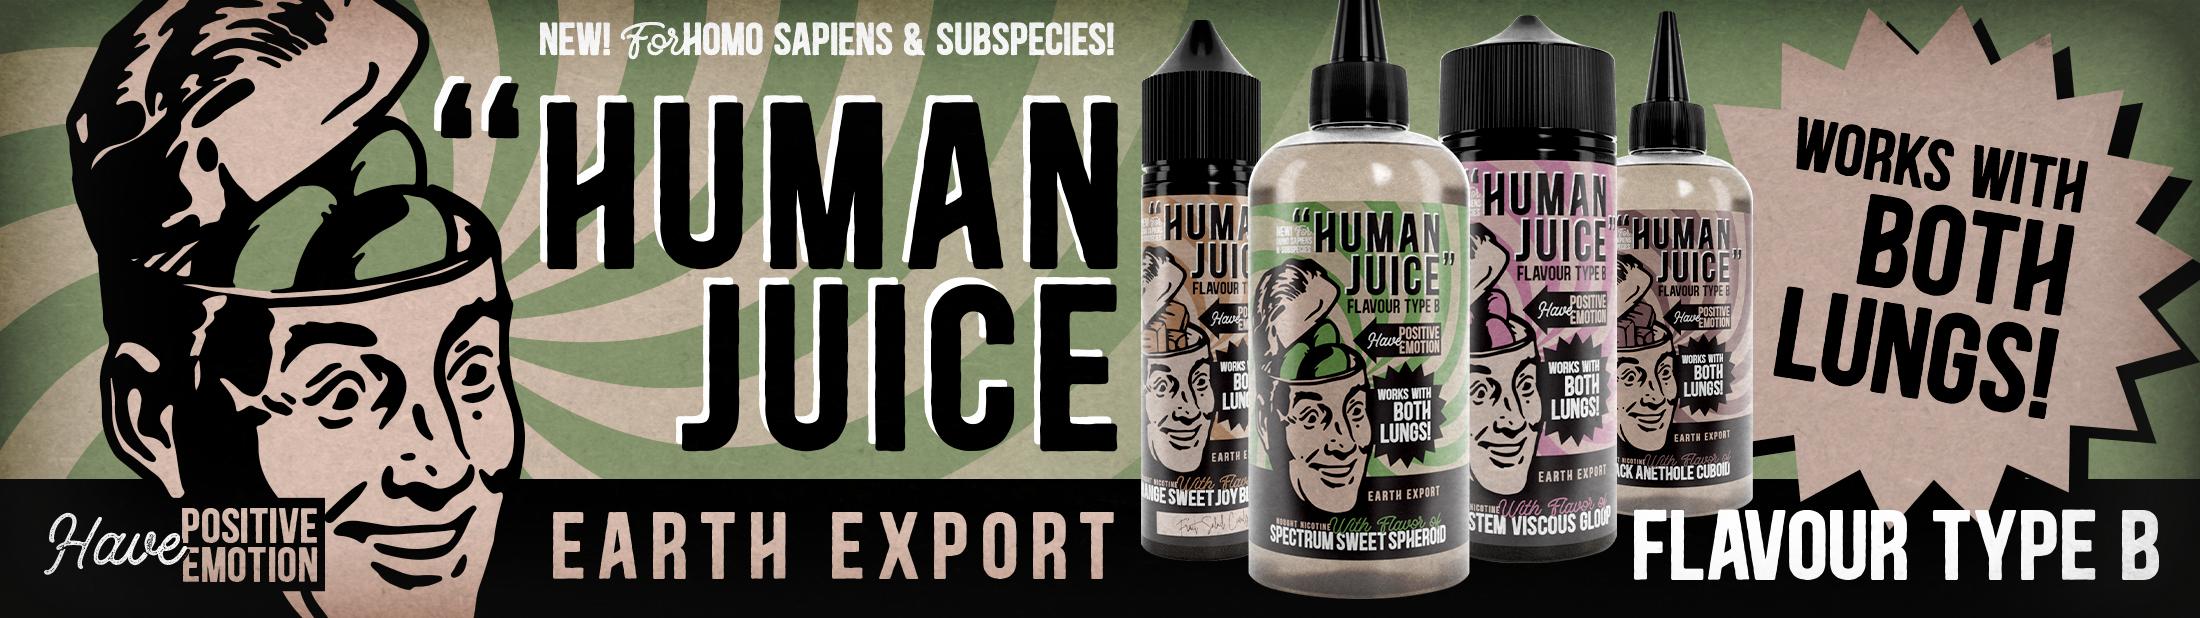 Human Juice